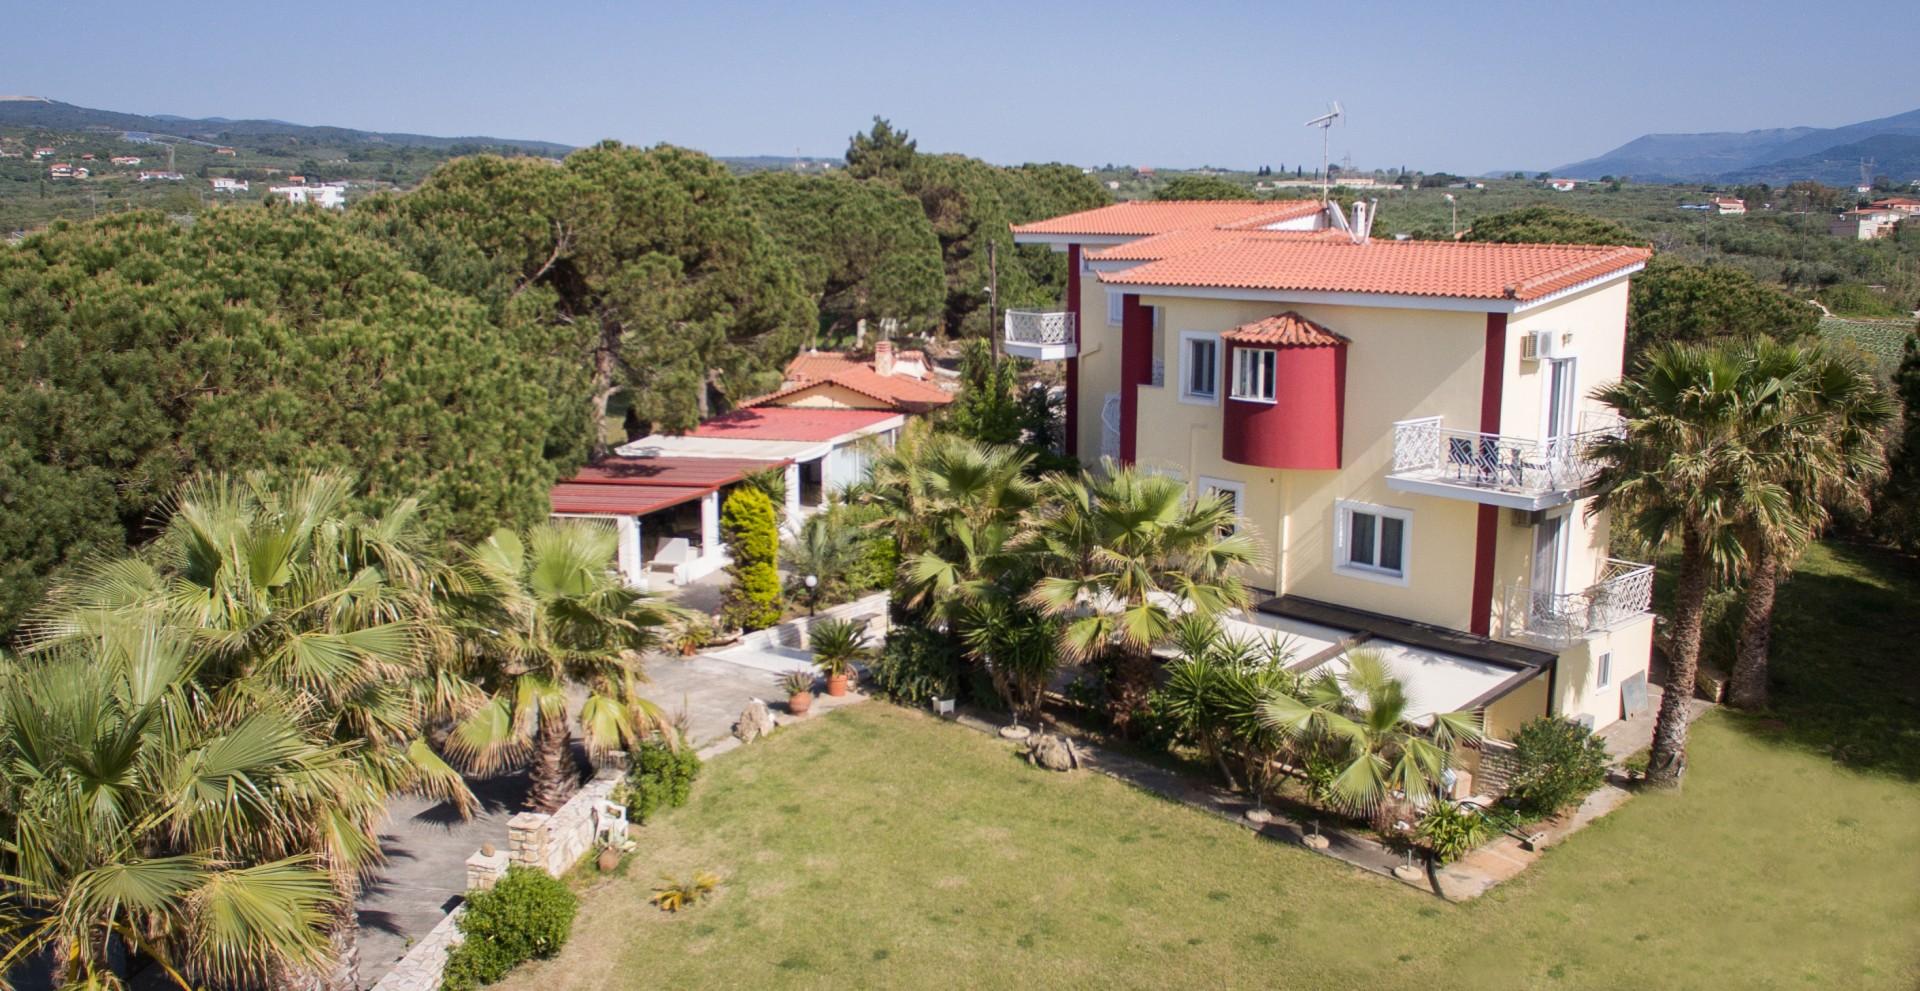 Aerial View of Irida Resort Suites